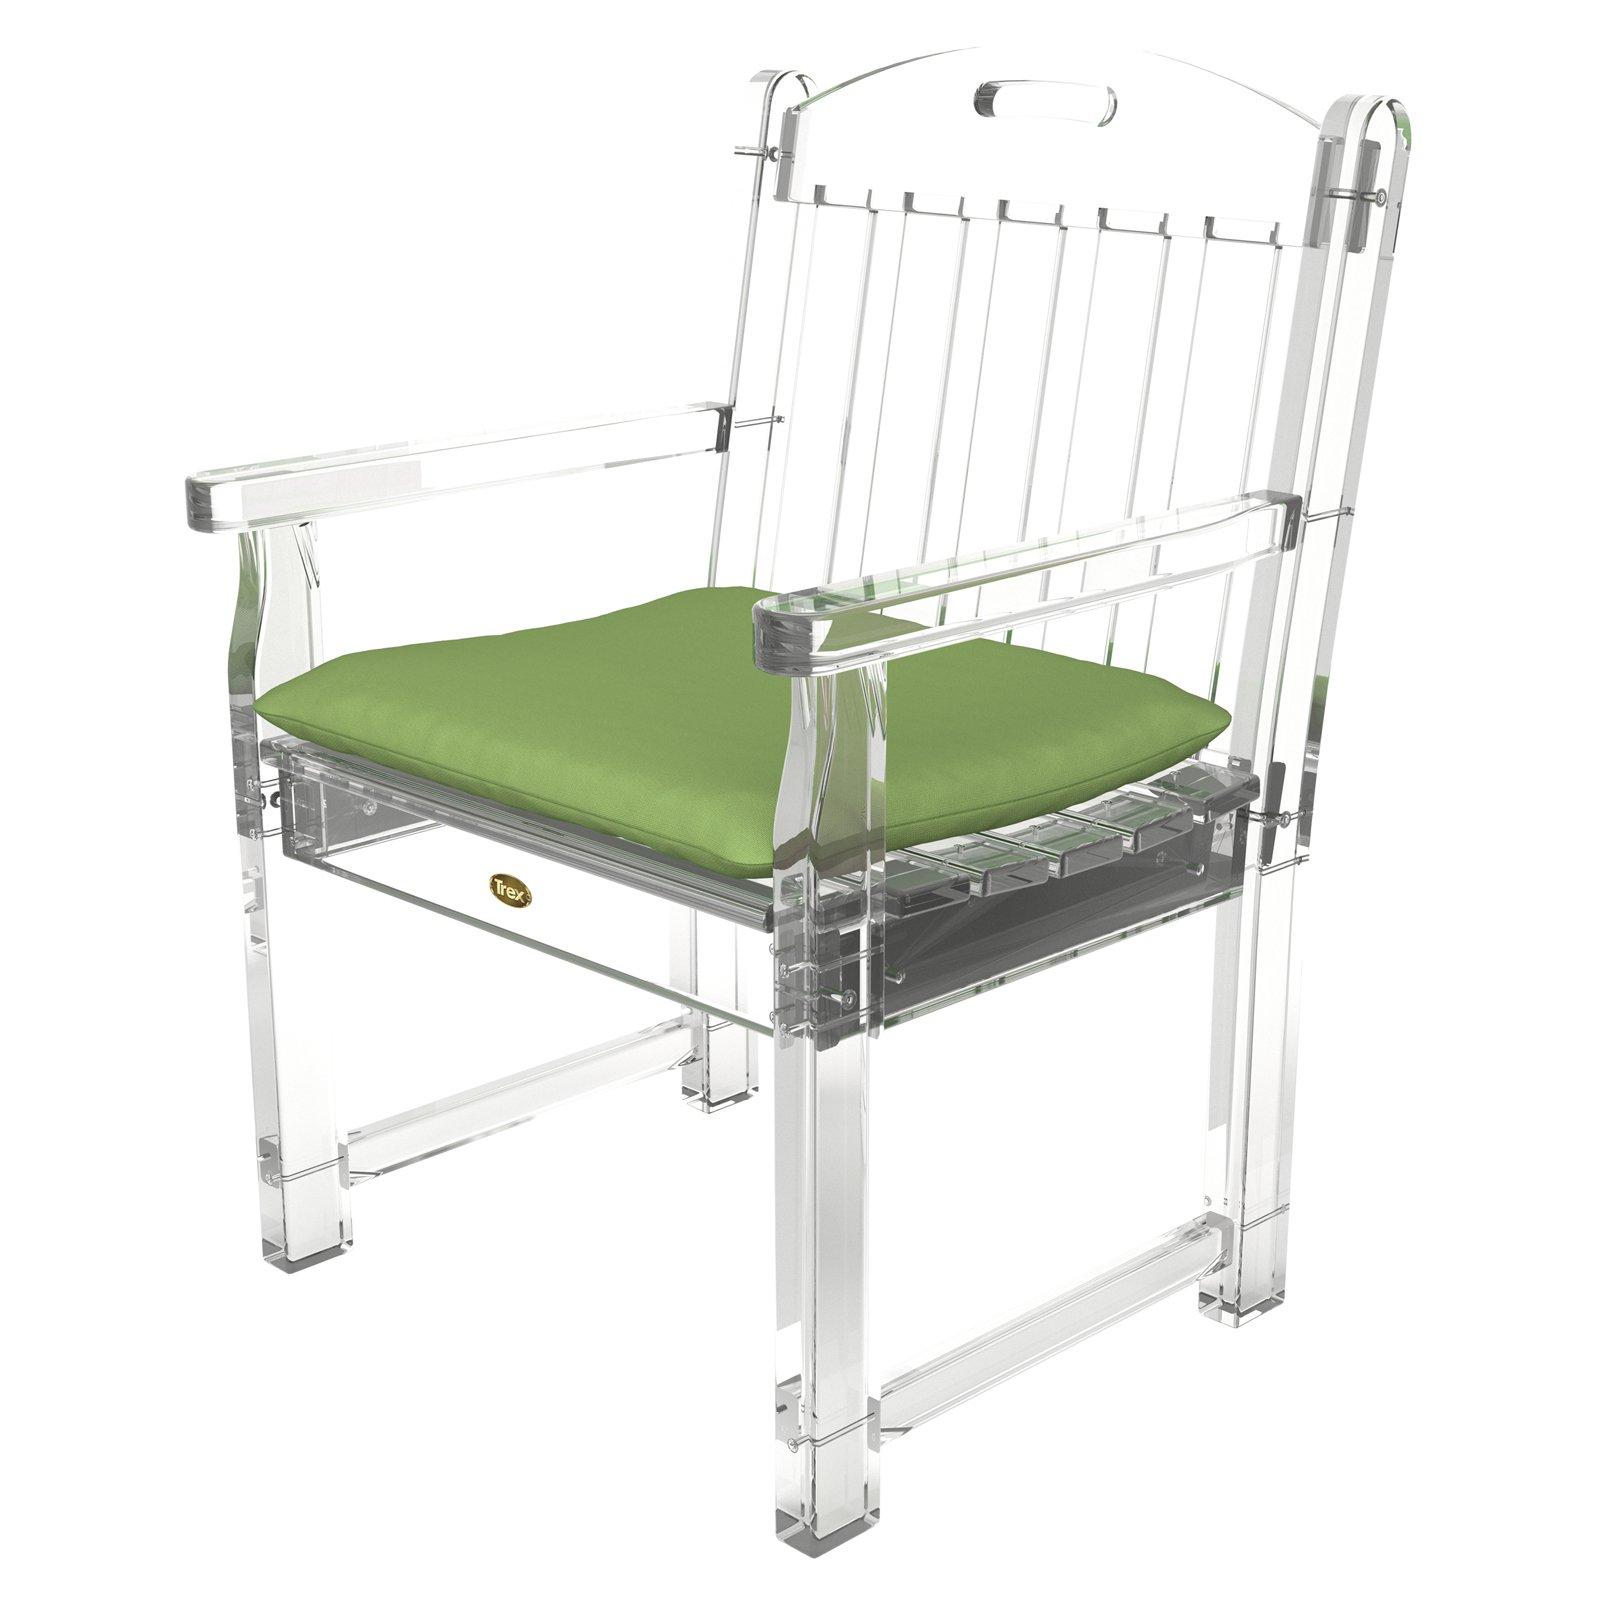 Trex Outdoor Furniture Sunbrella 21 x 18.5 Yacht Club Seat Cushion